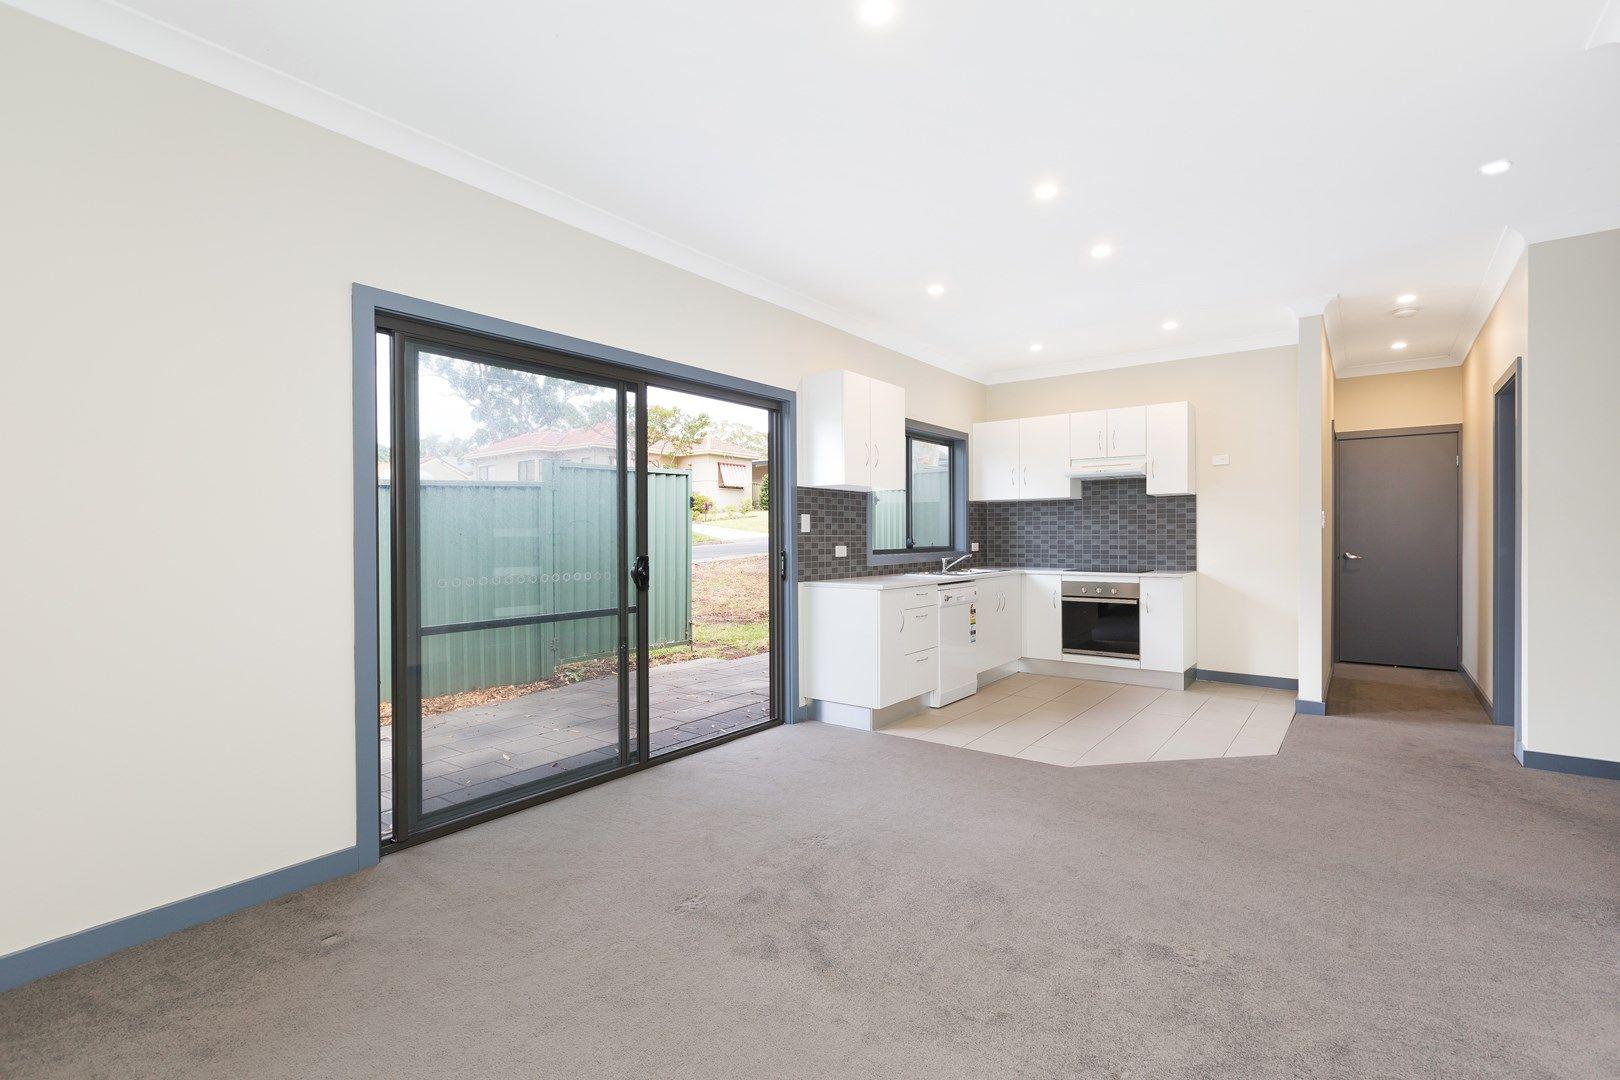 32A Kanoona Street, Caringbah South NSW 2229, Image 0